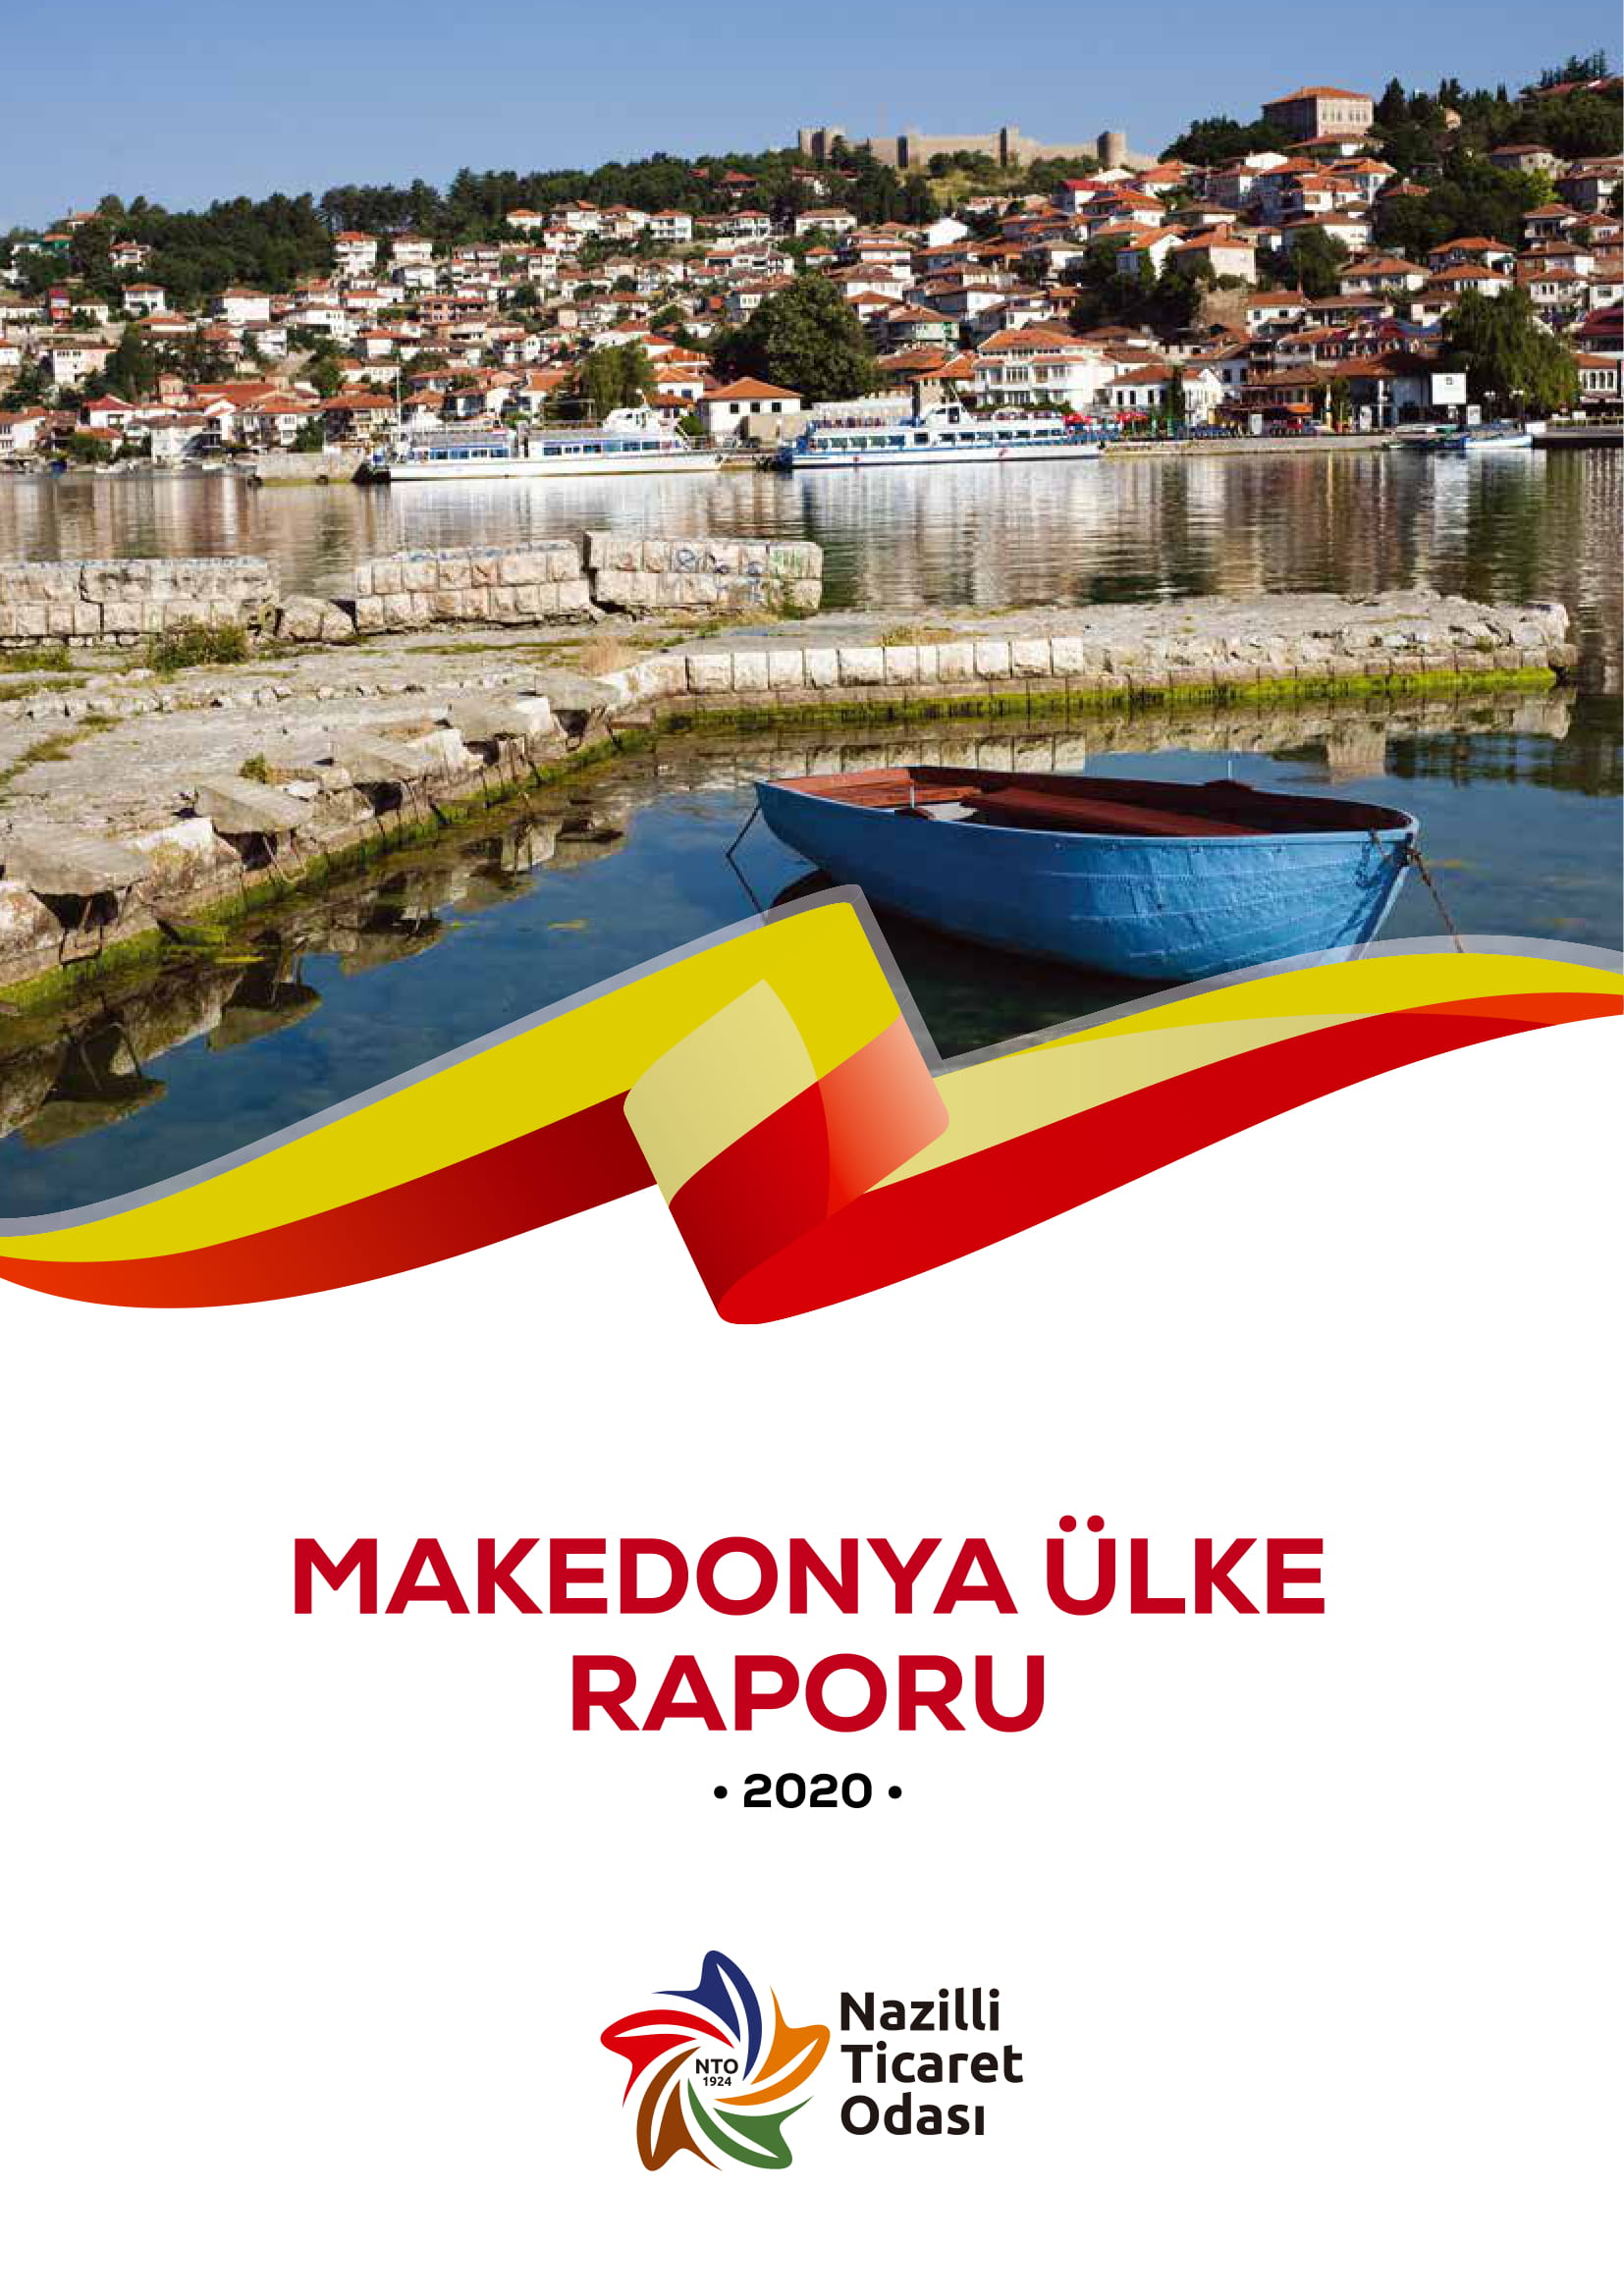 makedonya-ulke-raporu-01